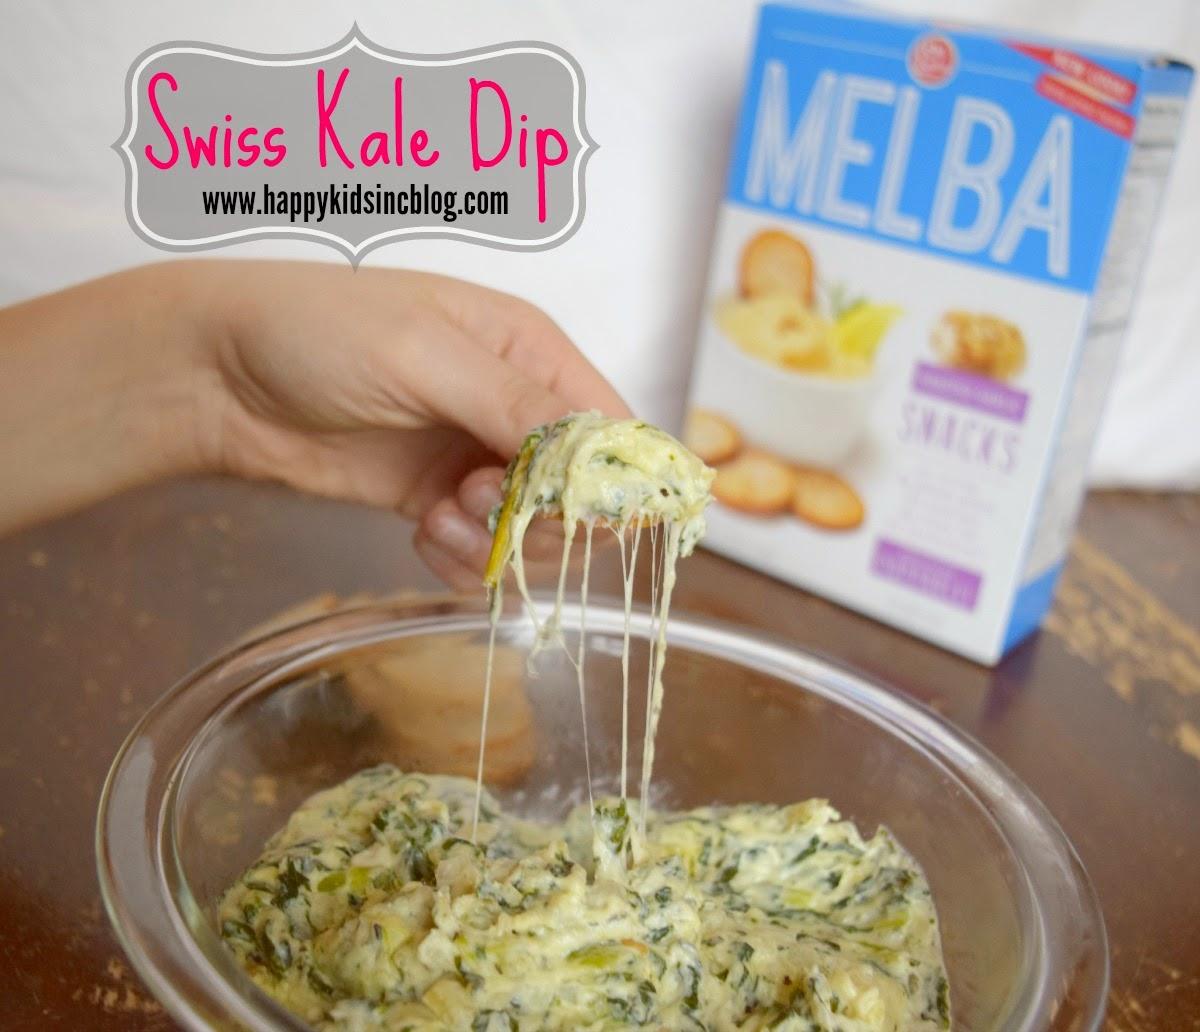 Swiss Kale Dip Recipe